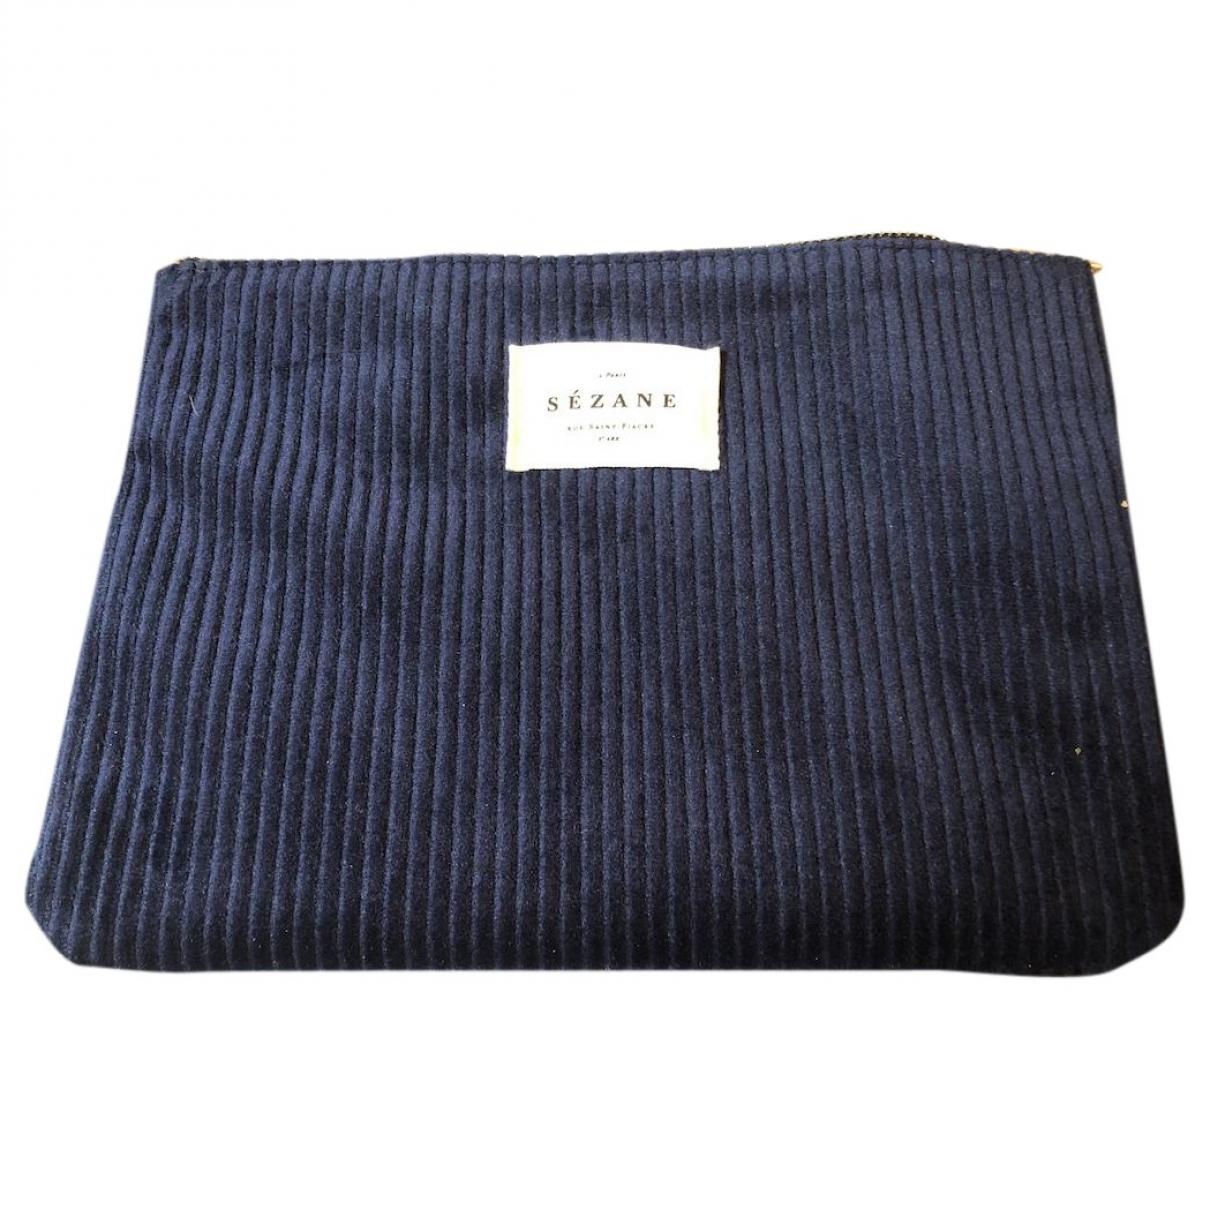 Sezane - Portefeuille   pour femme en velours - bleu